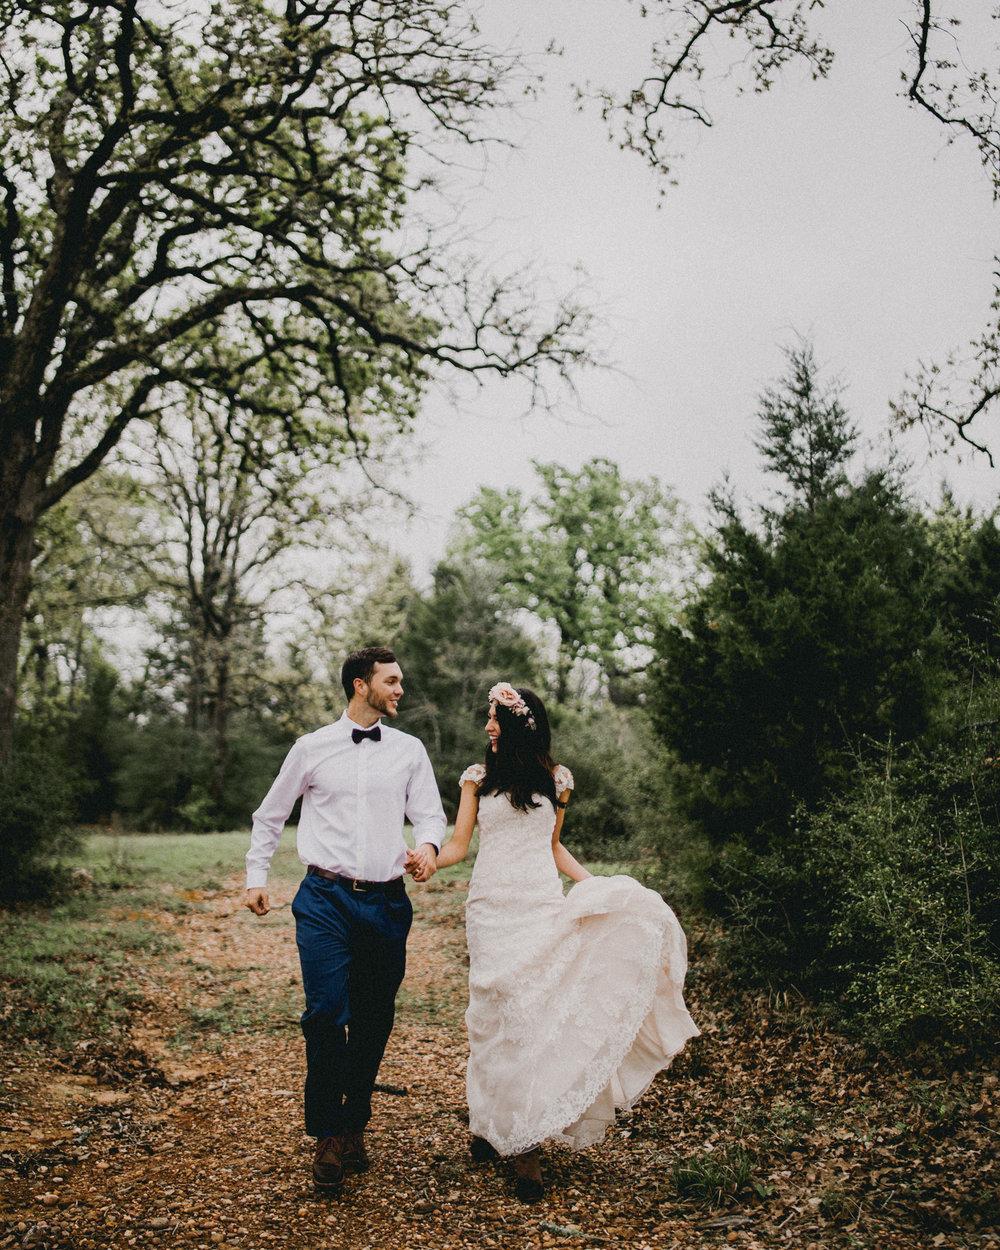 Breshears After Bridal Session Blog-41.jpg